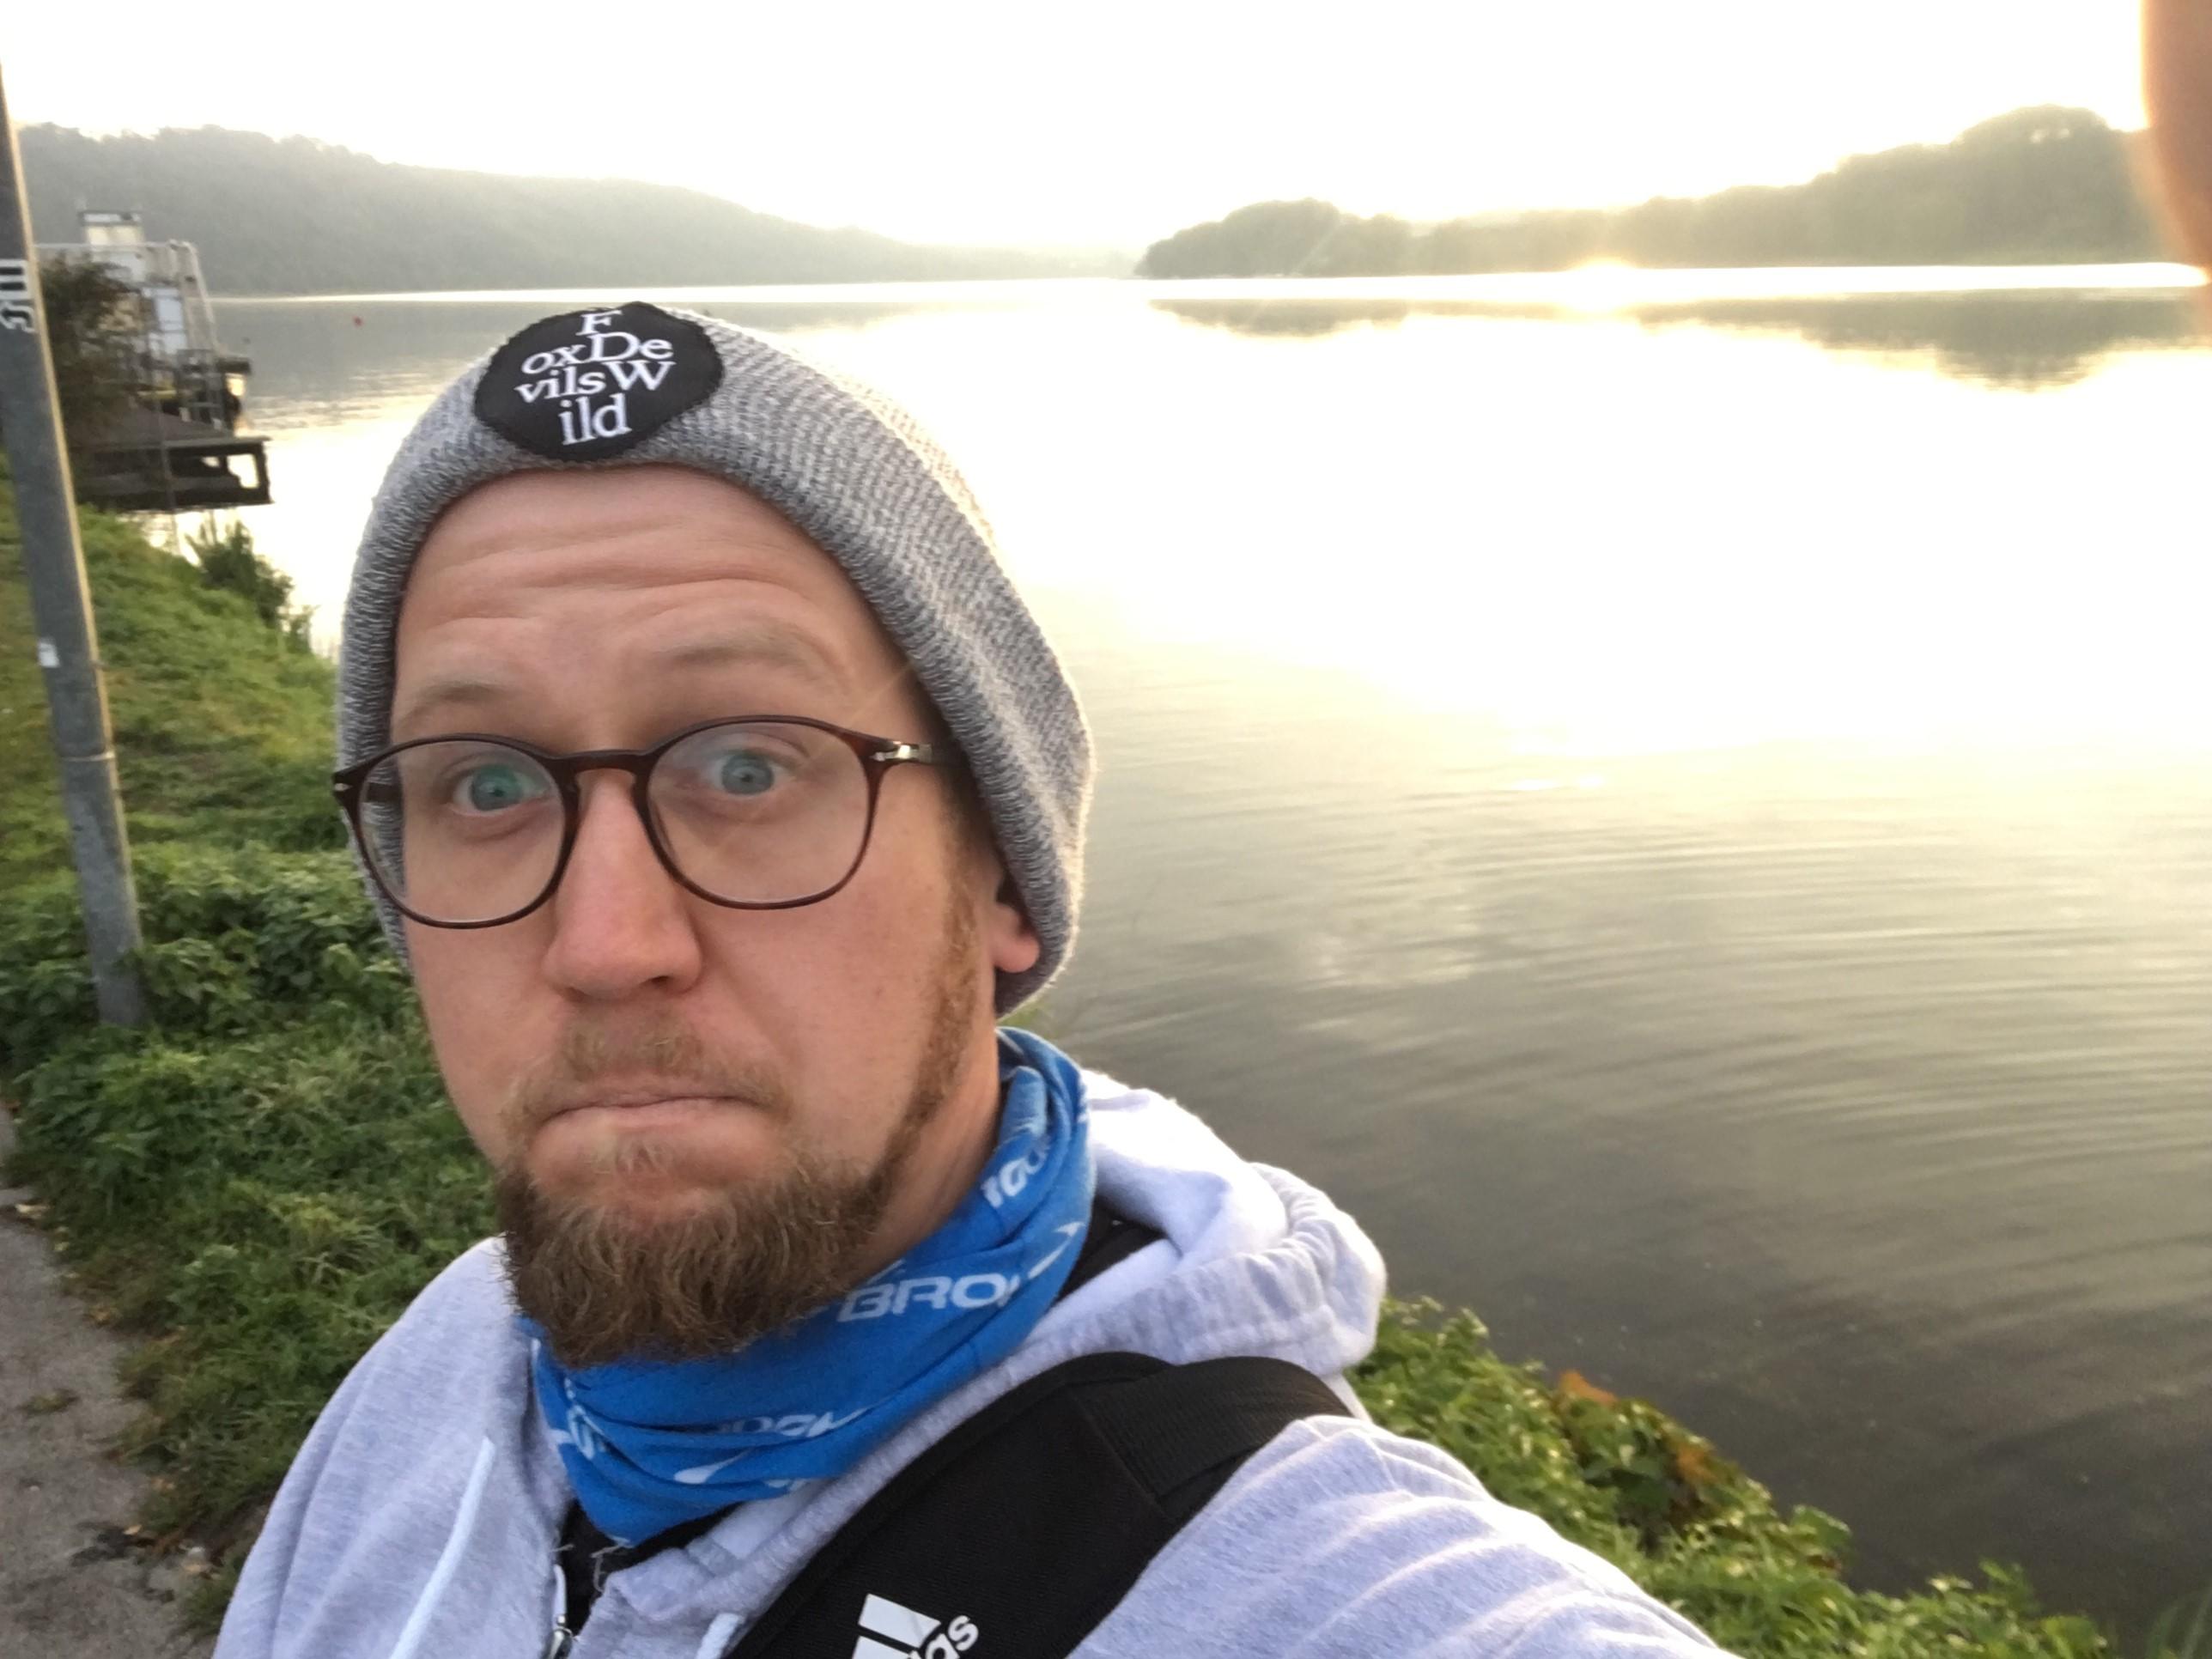 FatBoysRun Episode 63 – Marathon